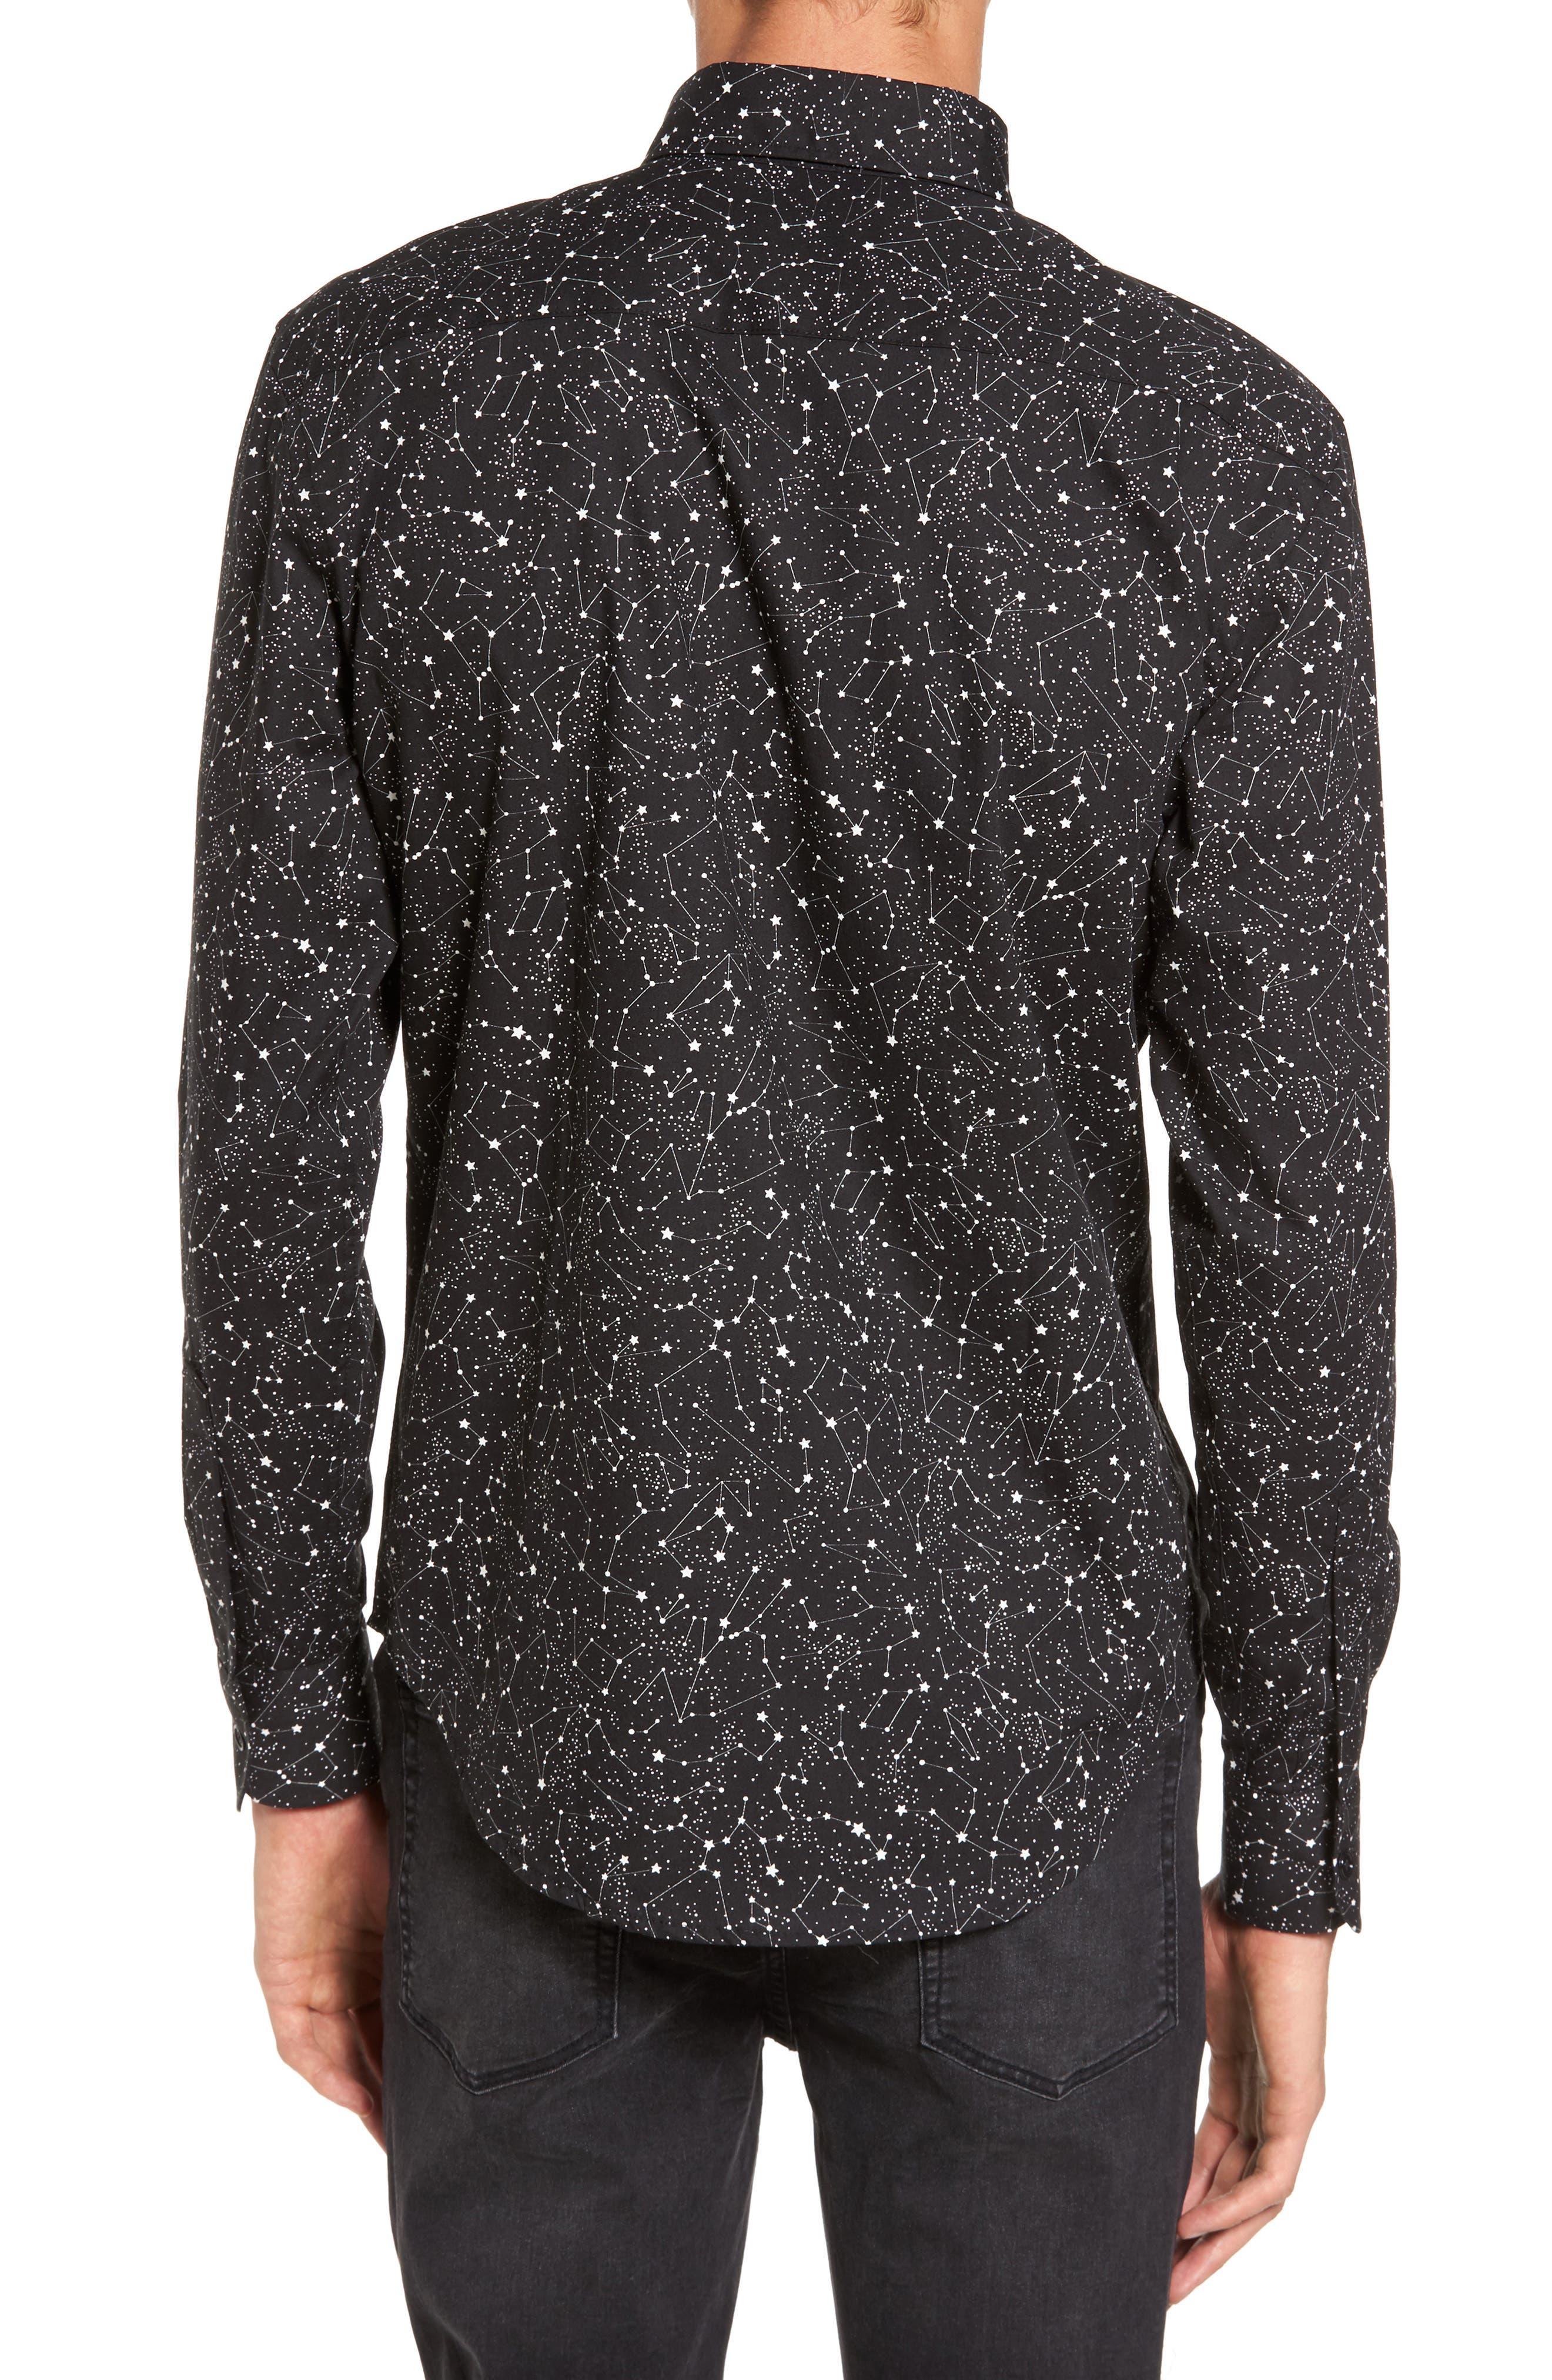 Constellations Shirt,                             Alternate thumbnail 2, color,                             Black